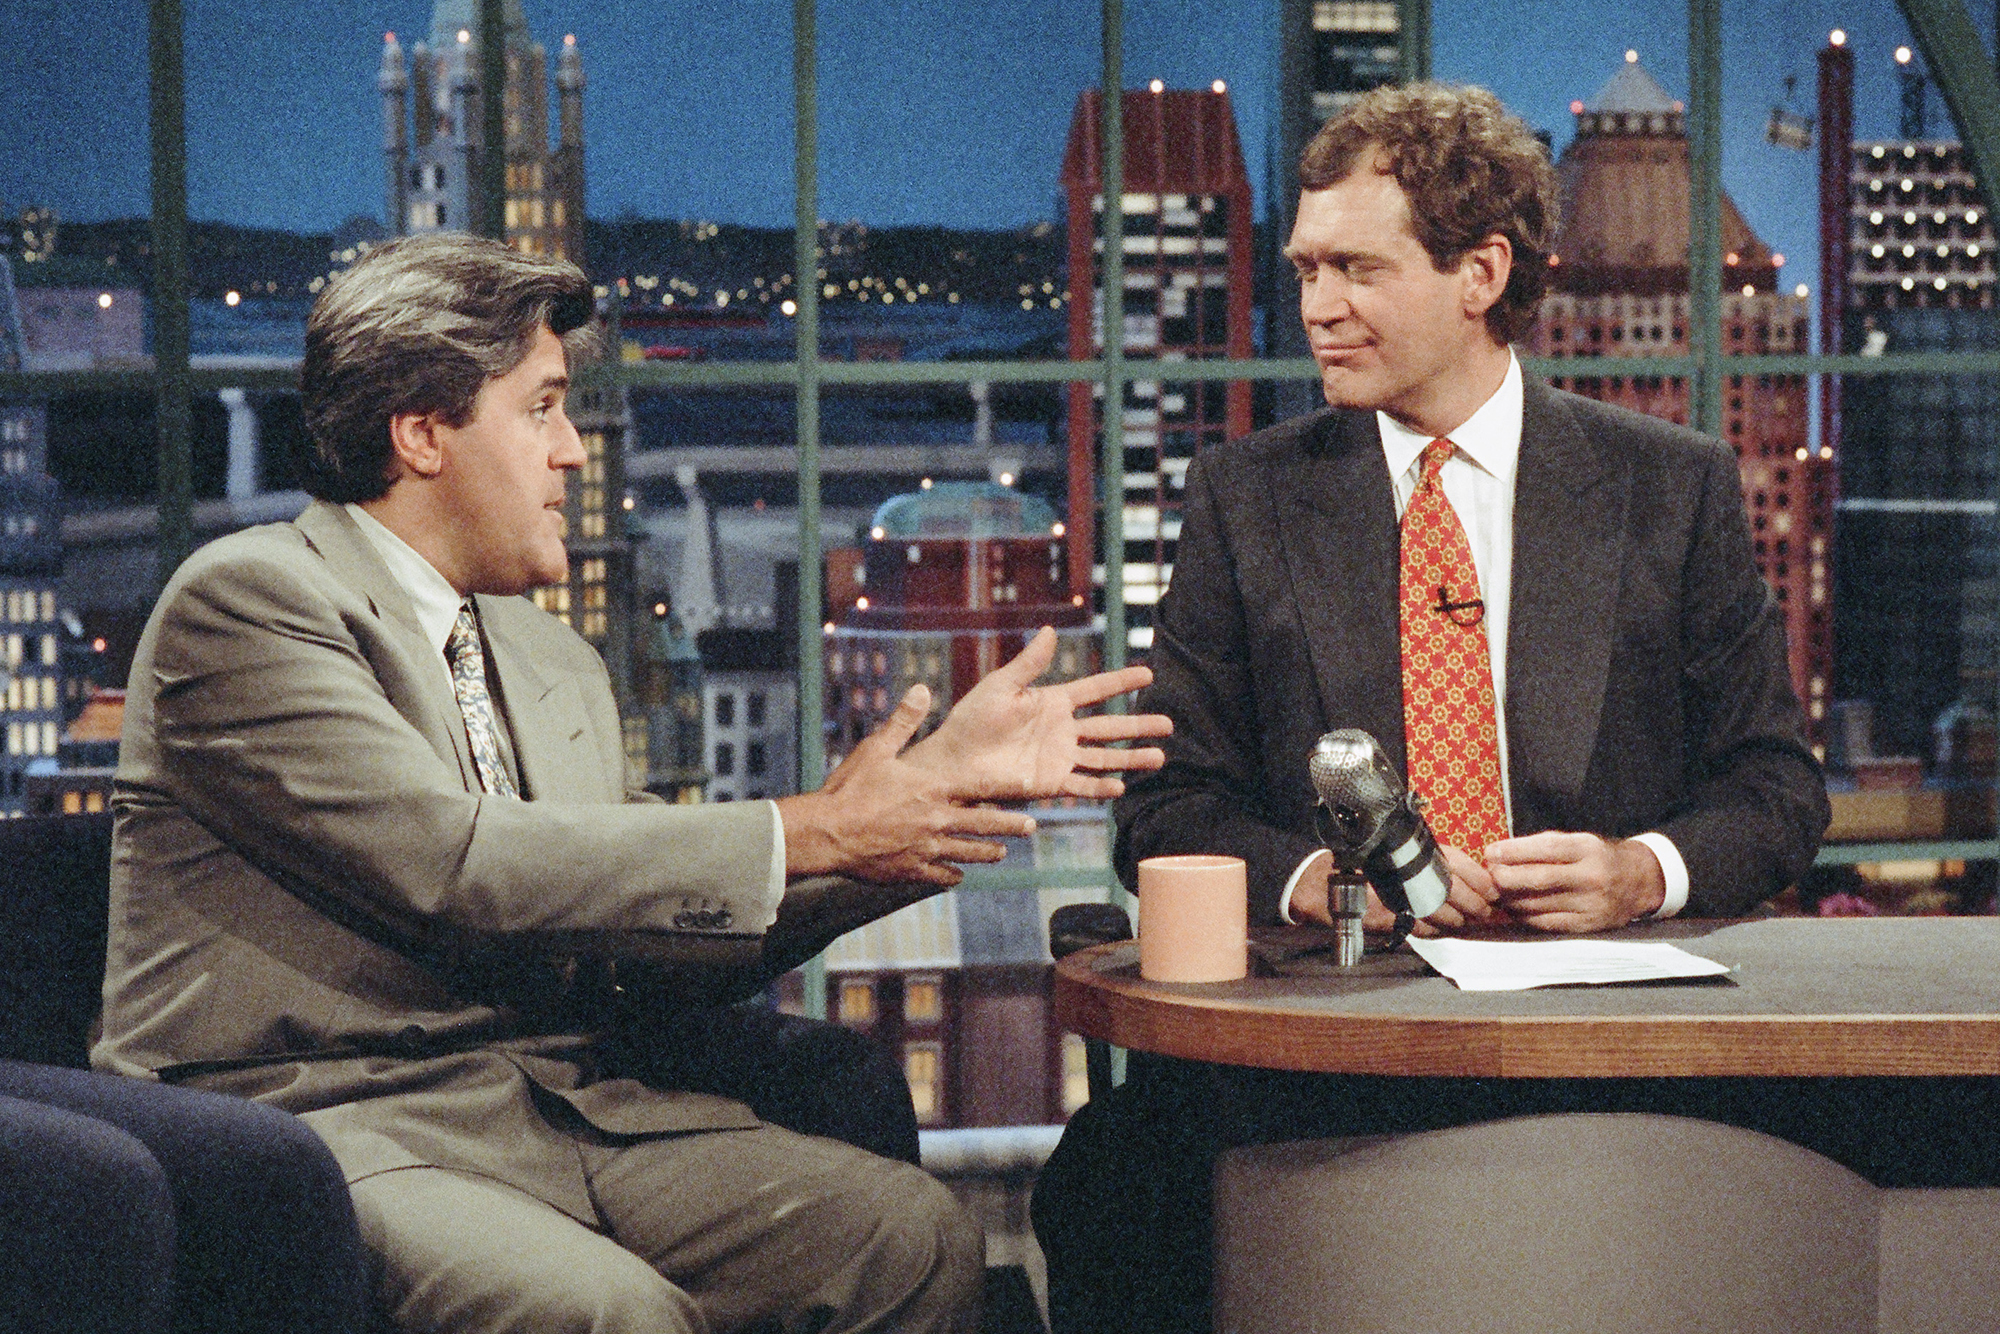 Late Night with David Letterman - Season 11